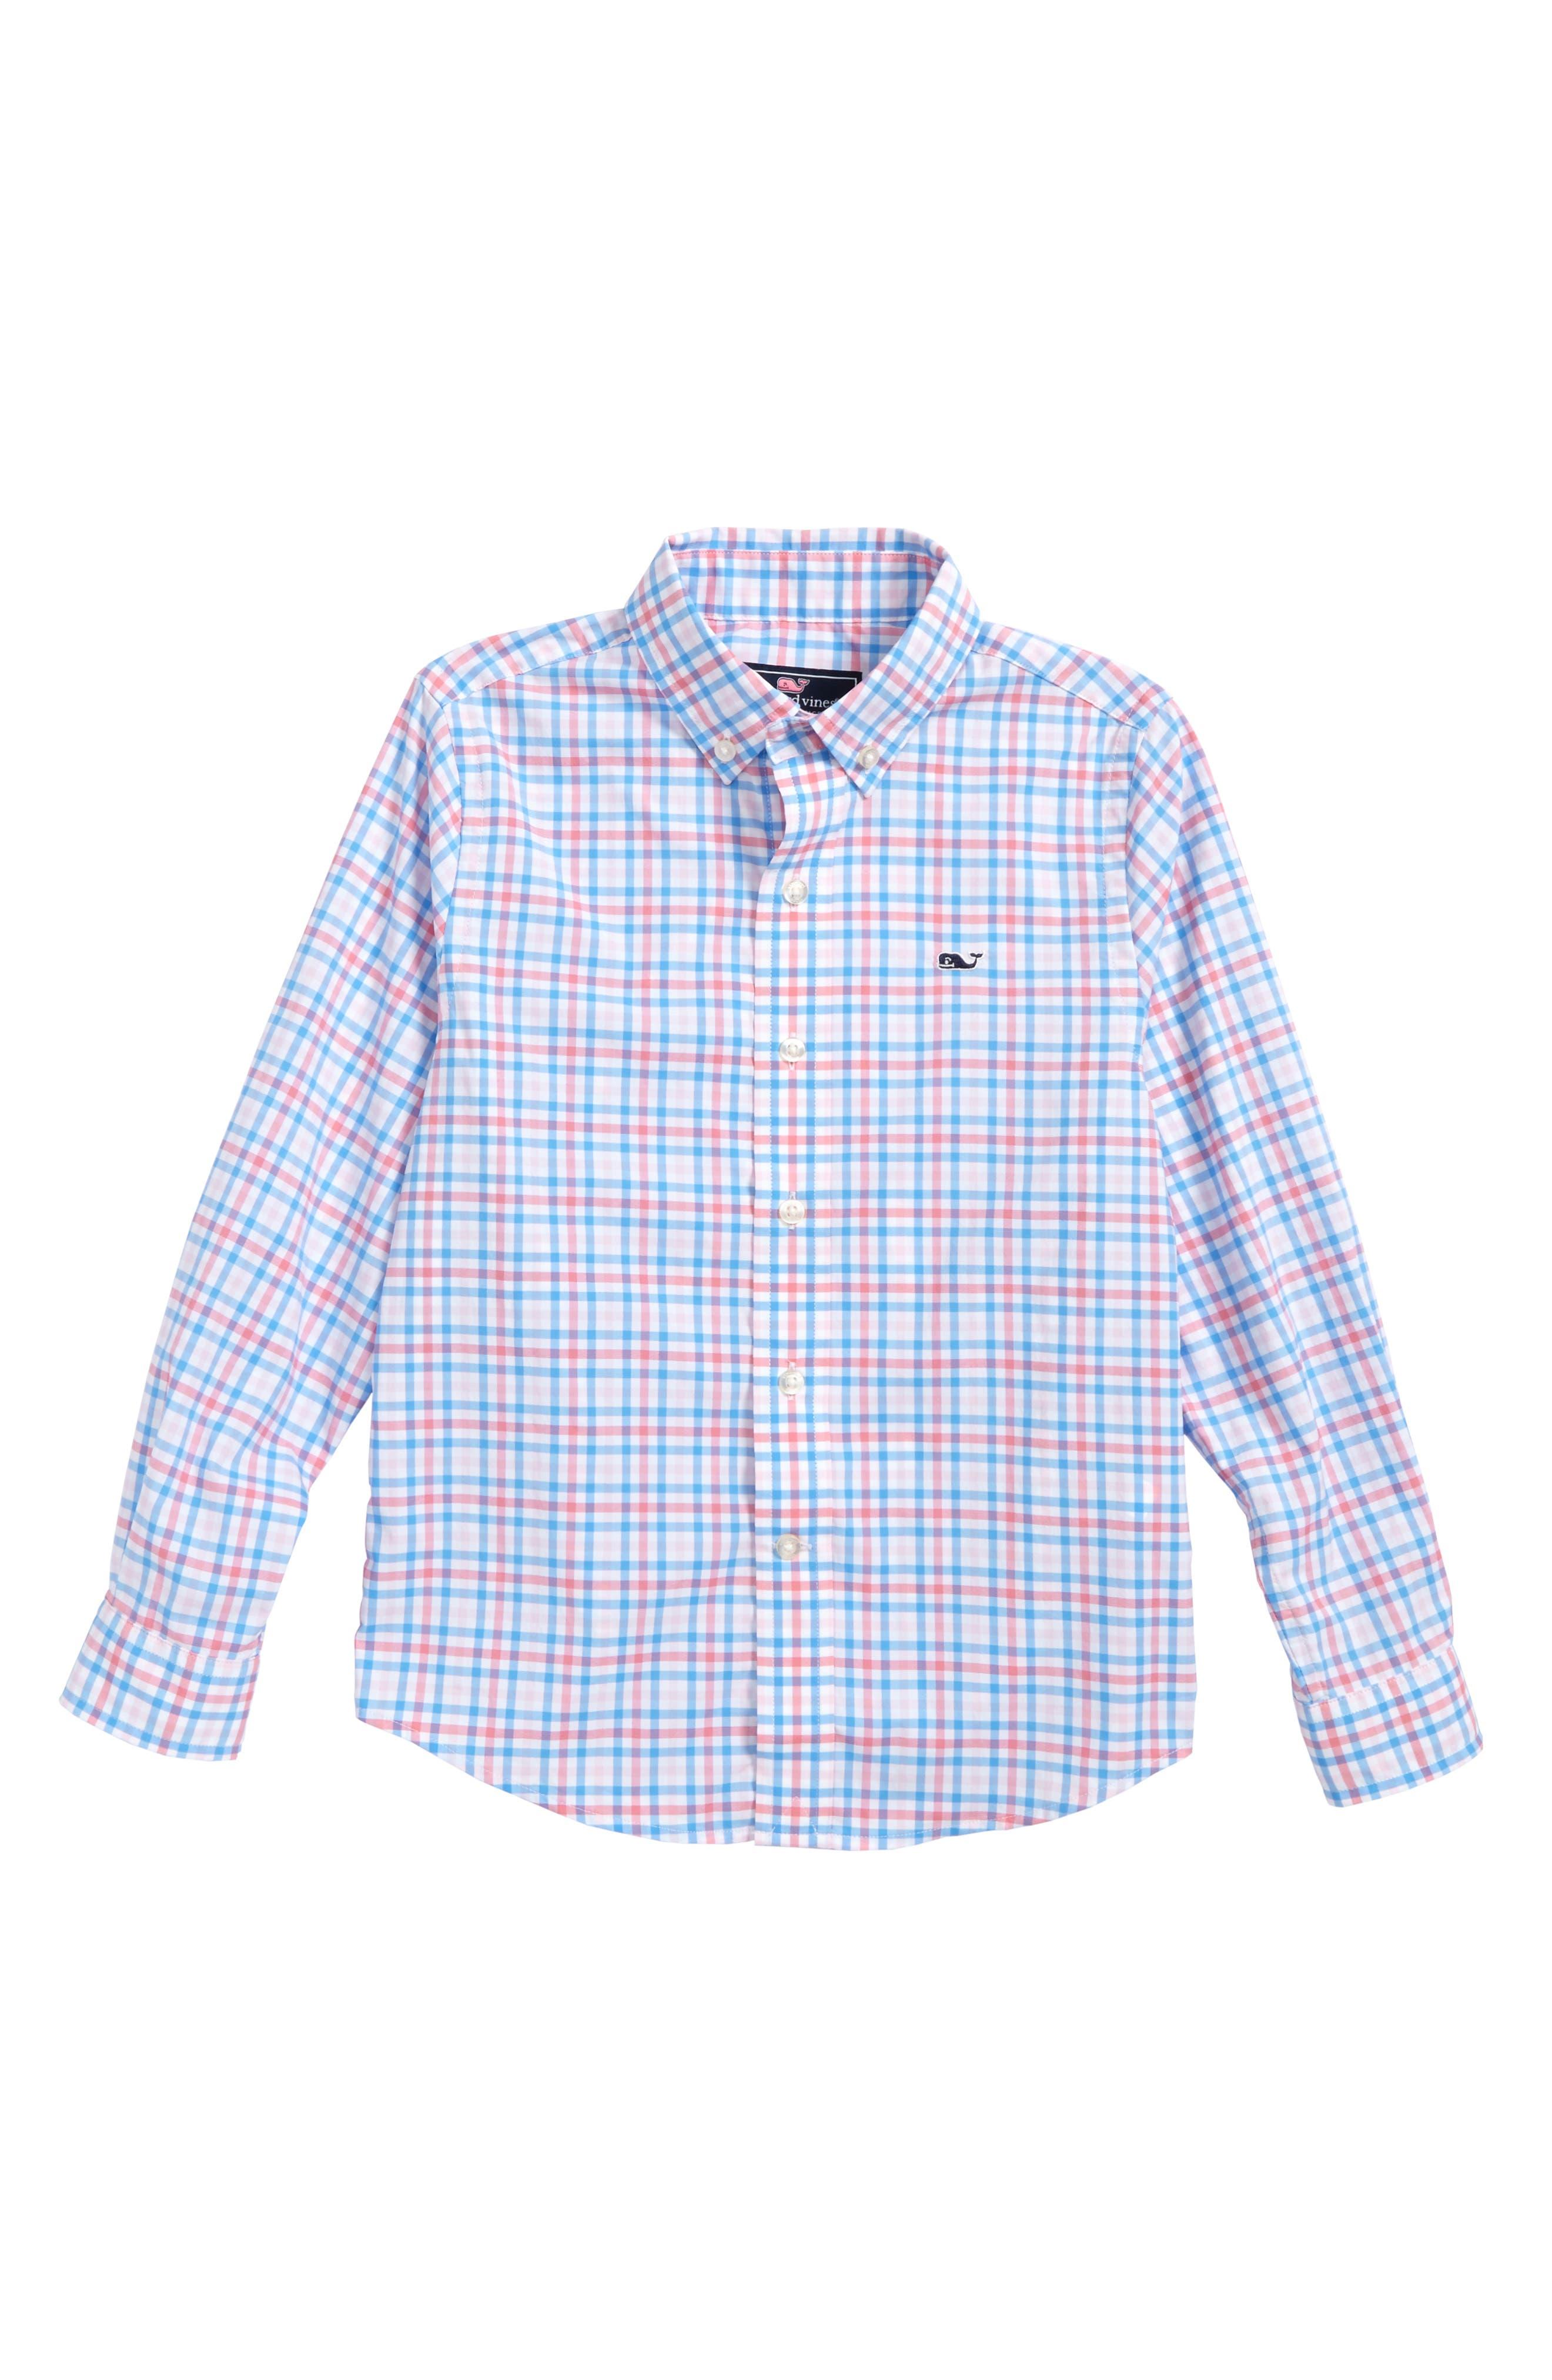 Gulf Shore Gingham Performance Woven Shirt,                         Main,                         color, Bahama Breeze